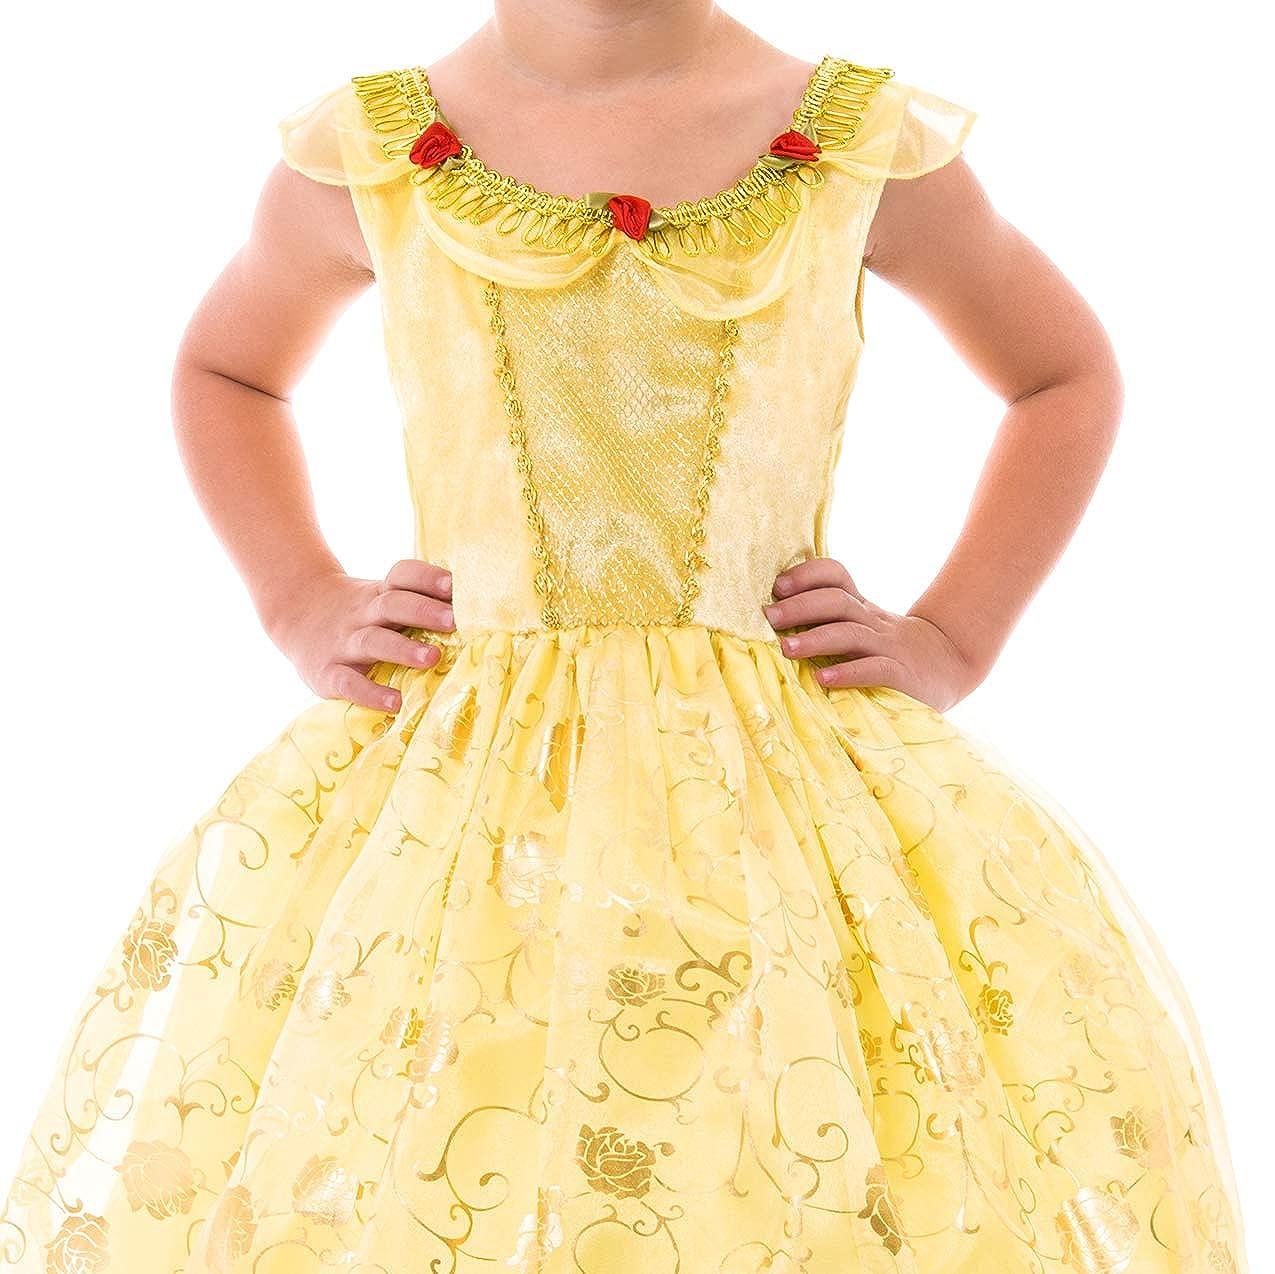 e58bd6ca37 Amazon.com  Yellow Beauty Costume Dress  Toys   Games